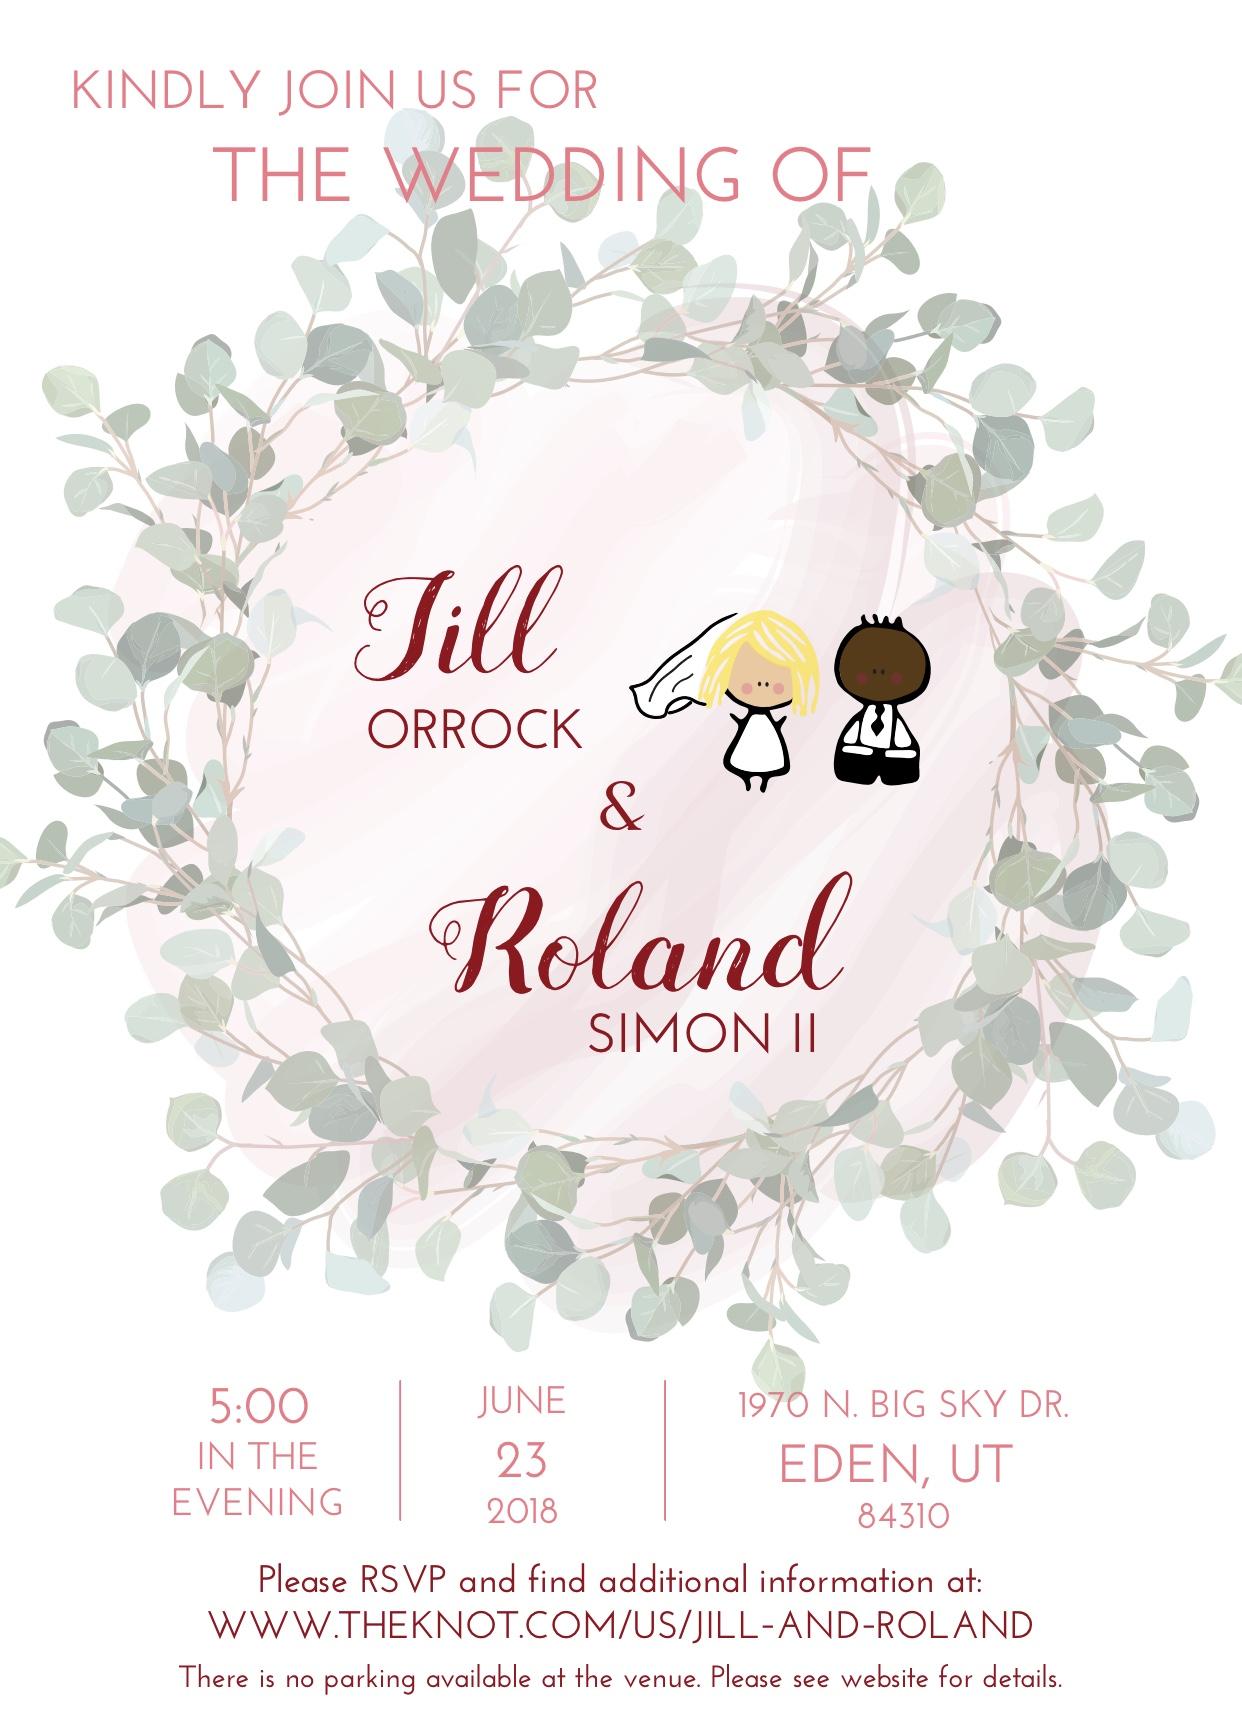 Custom designed wedding invitation (Jill and Roland).